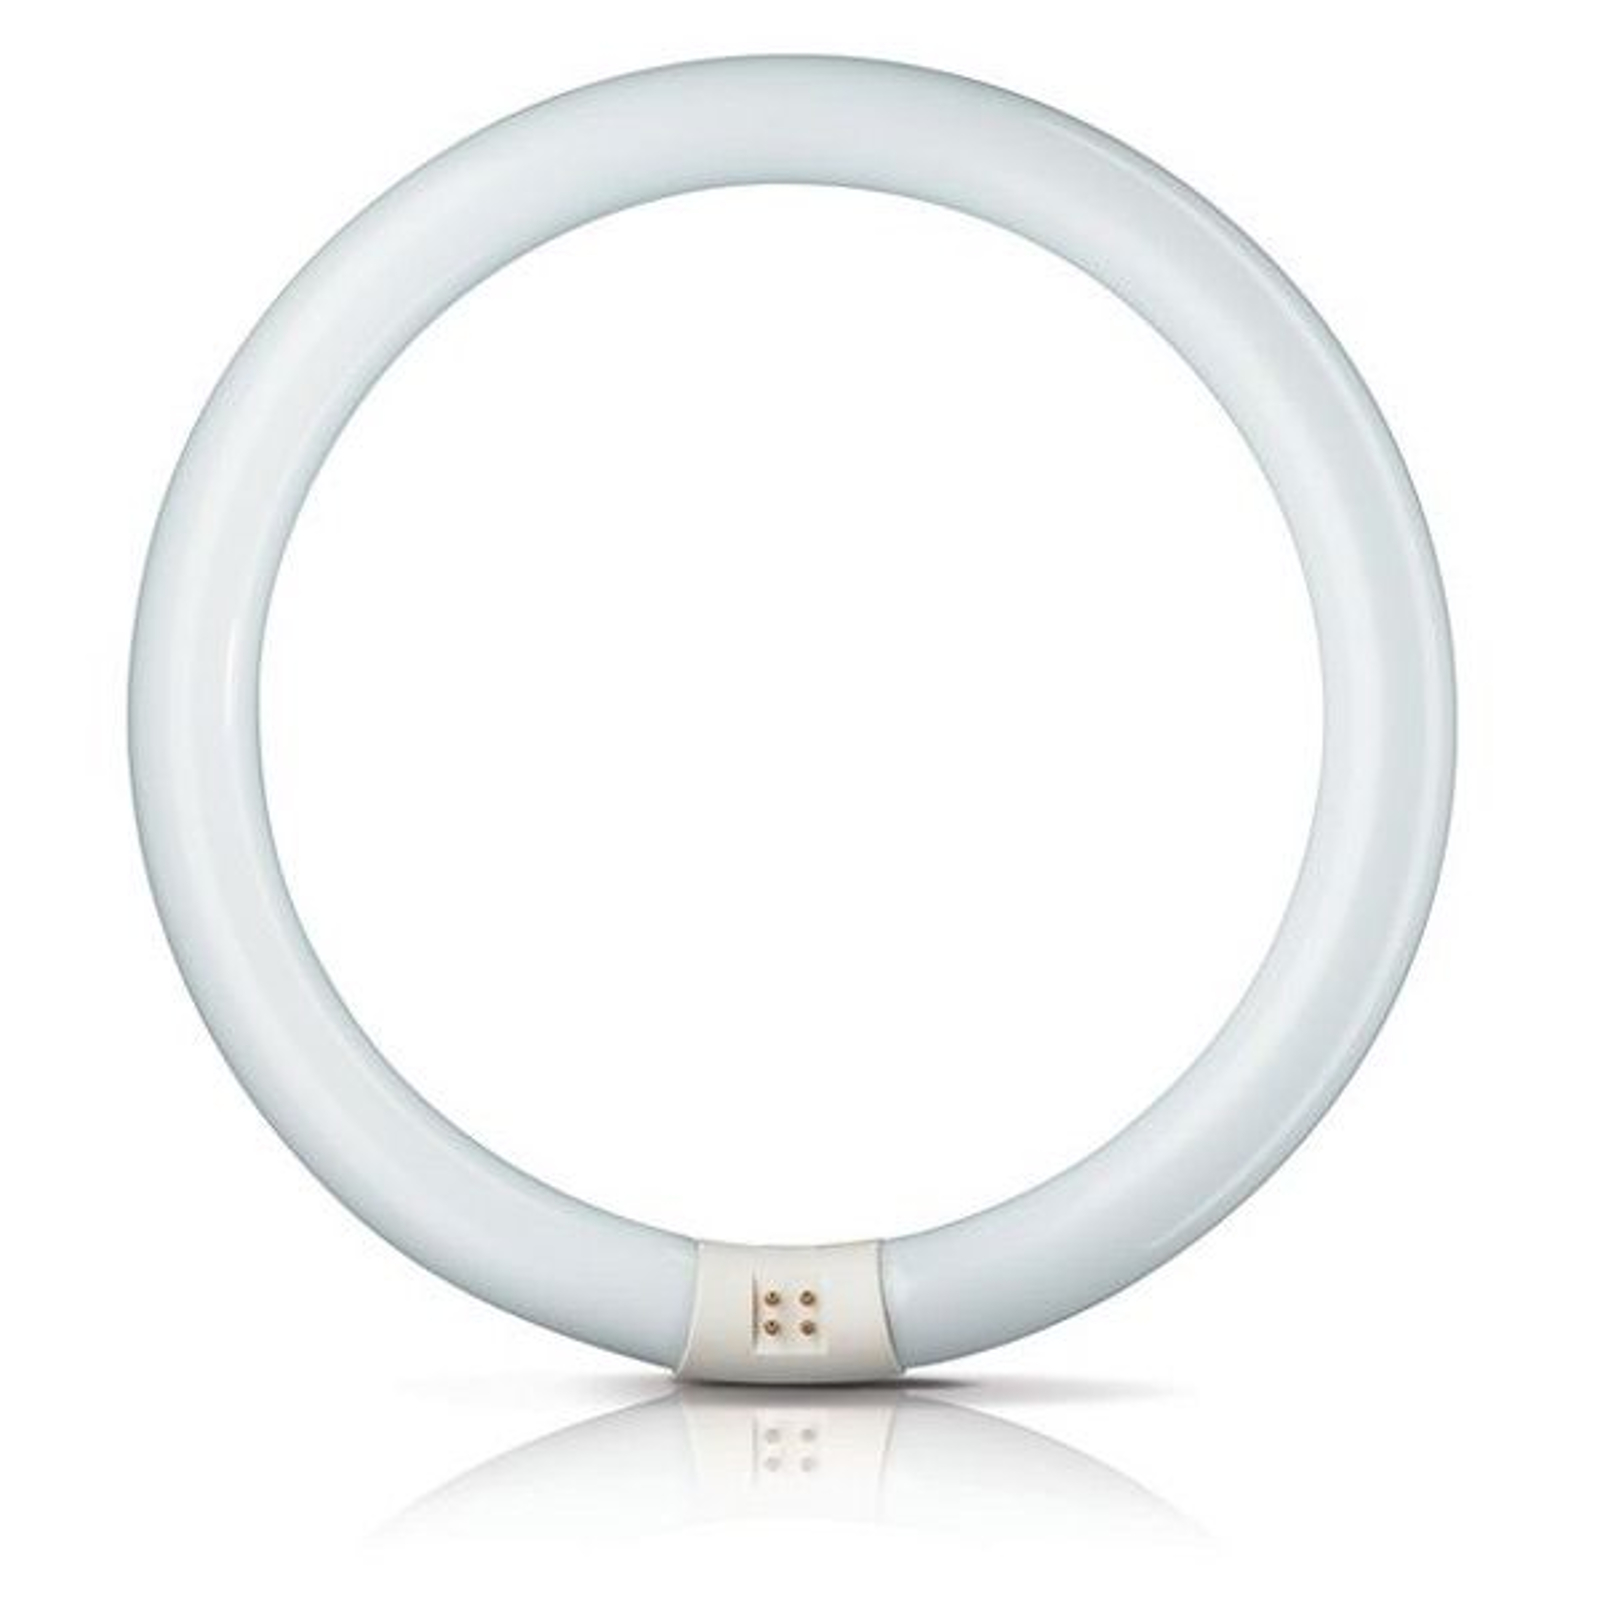 G10q 40W 830 lysstoffring Master Circular TL-E